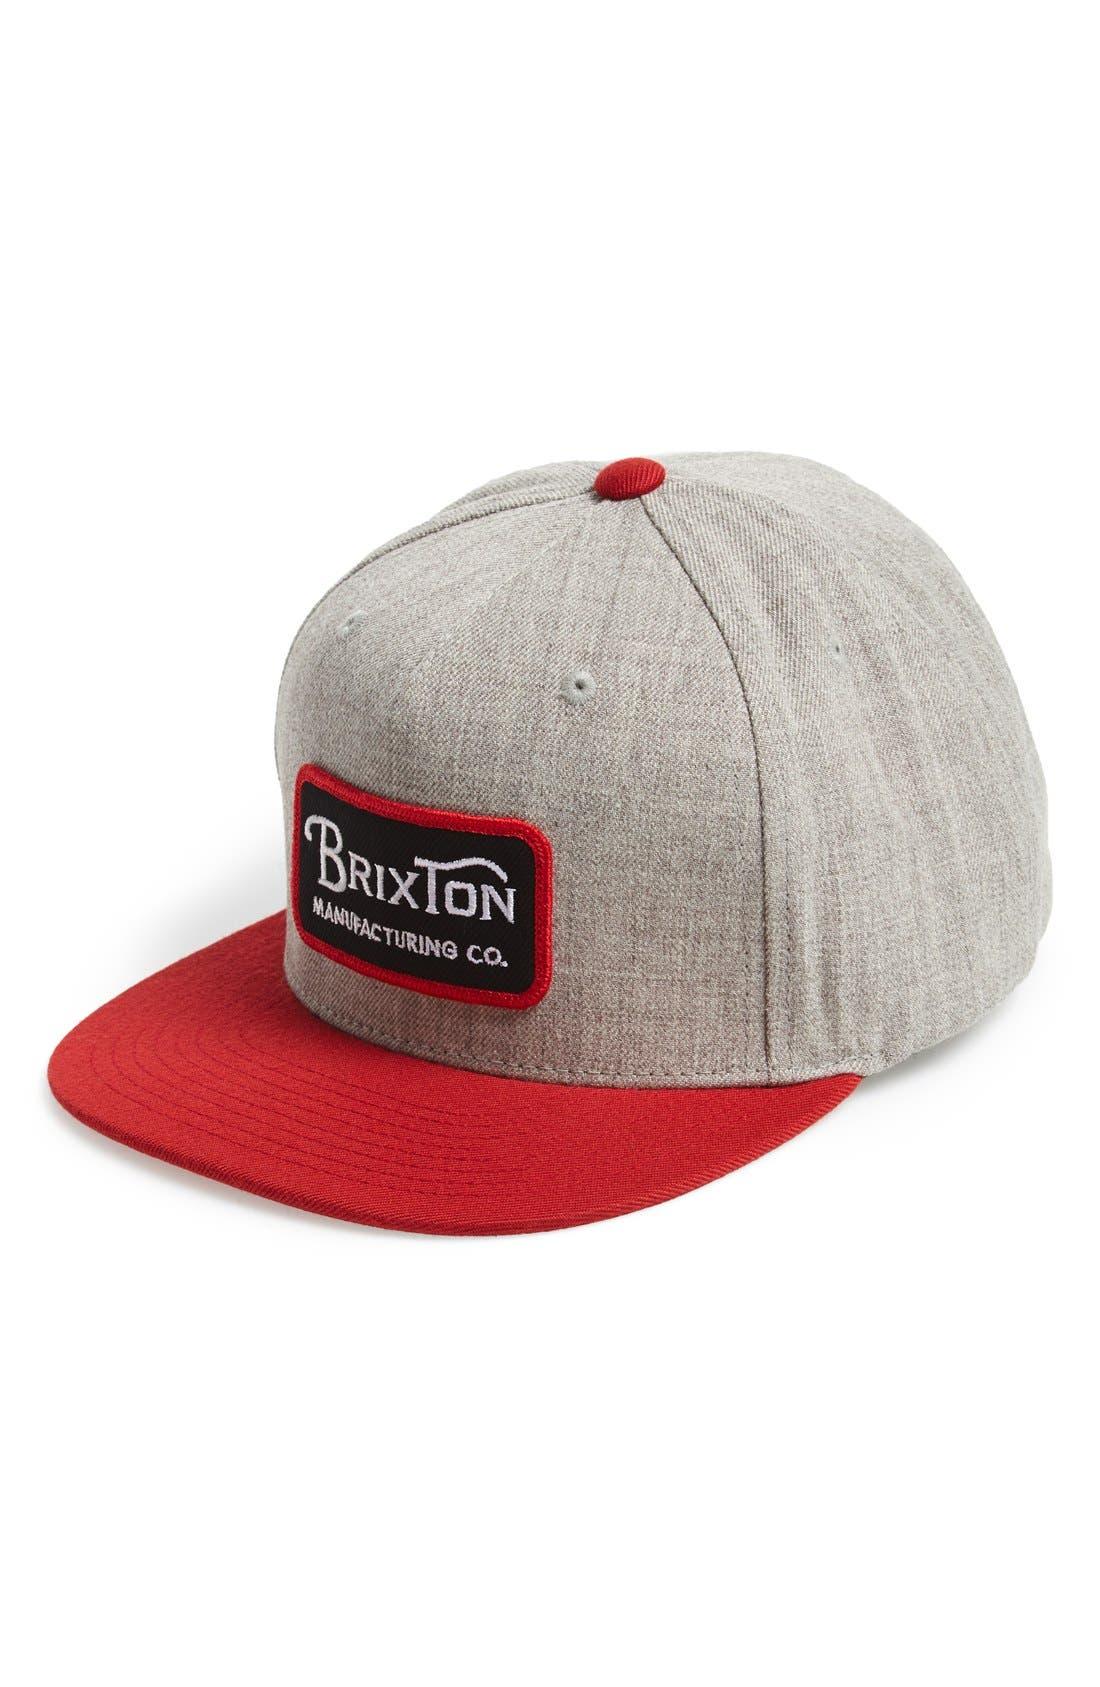 Main Image - Brixton 'Grade' Snapback Cap